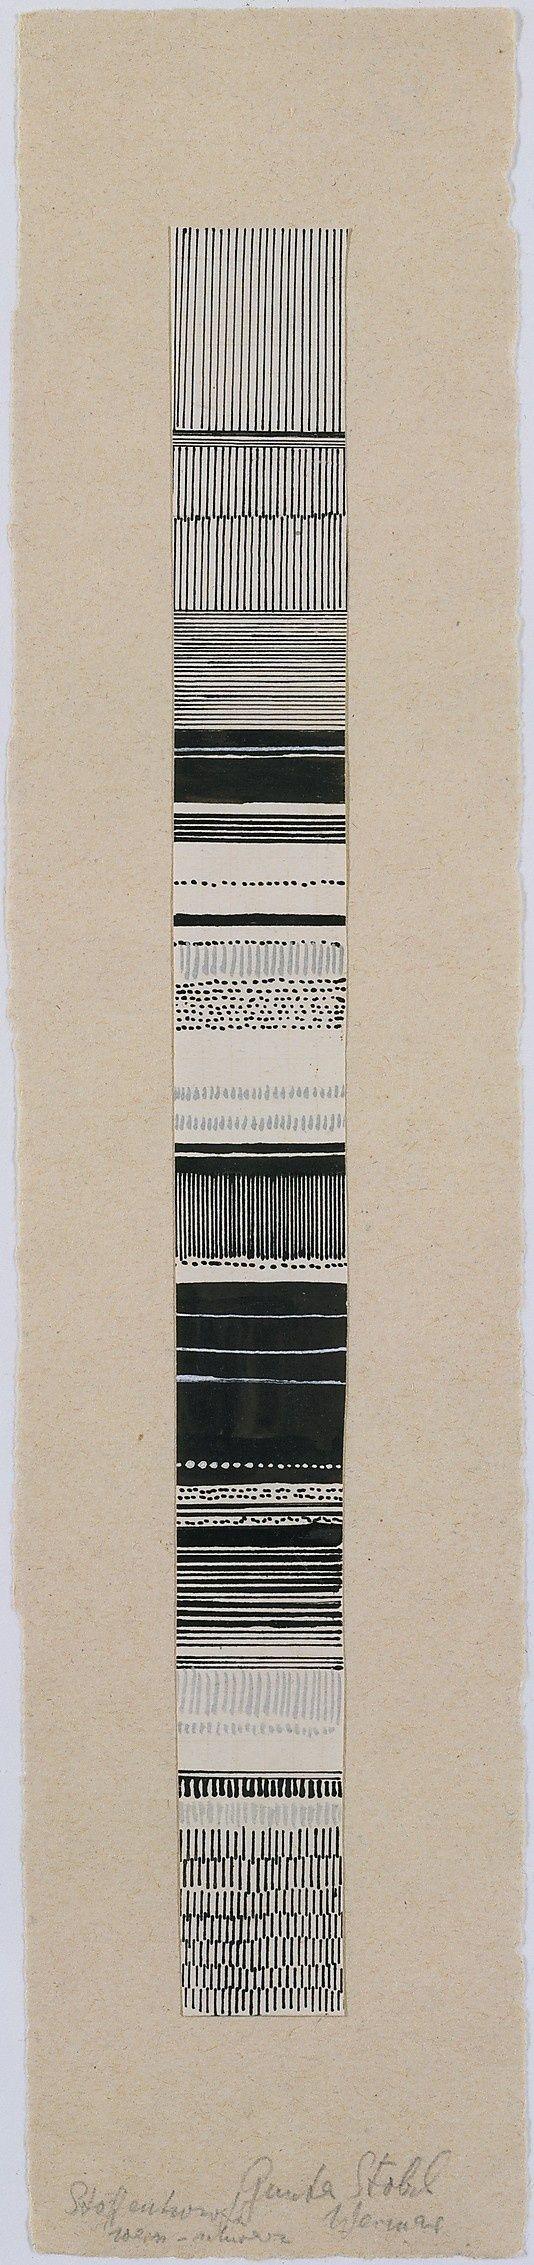 Pattern / Gunta Stölzl - Watercolor and ink fabric design, 1919–1925. Bauhaus Archive.